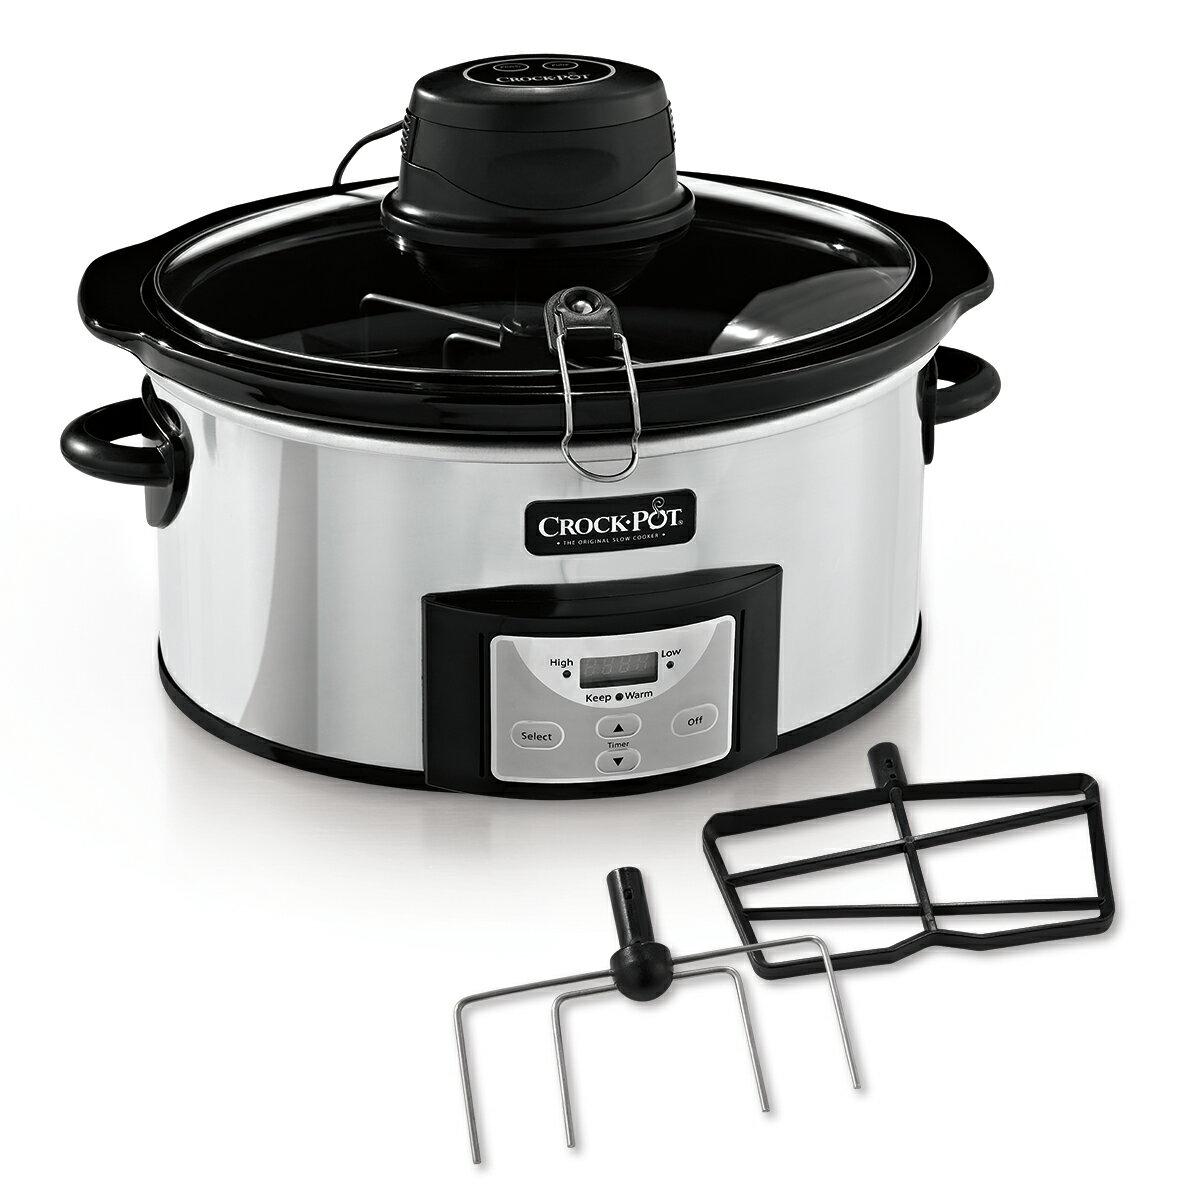 Crock-Pot 6-Quart Digital Slow Cooker with iStir™ Stirring System SCCPVC600AS-P 1